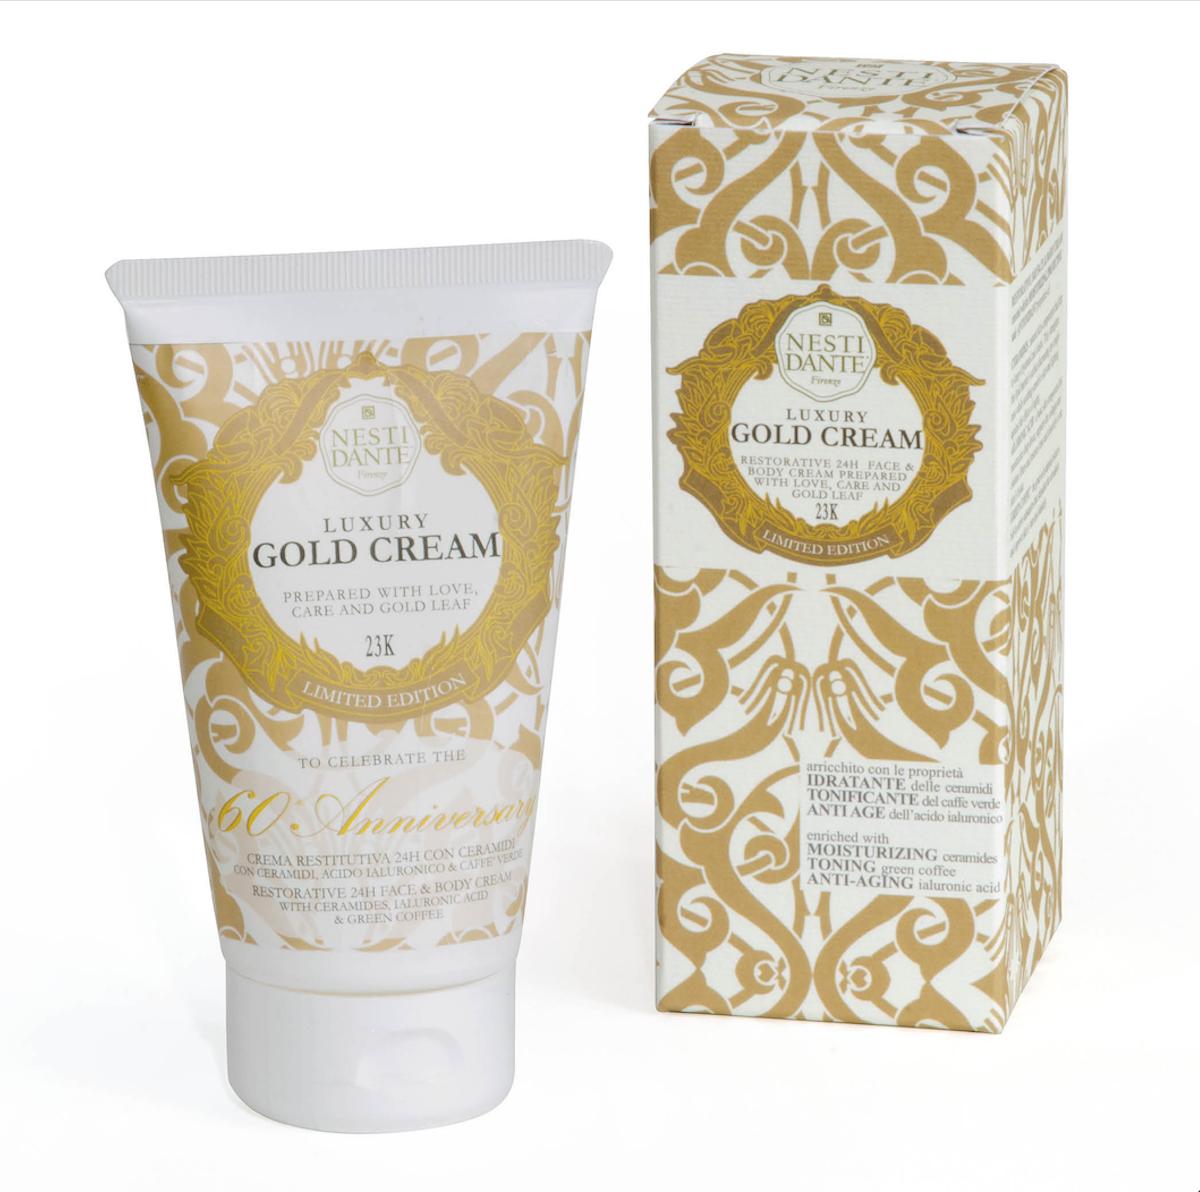 Nesti Dante Face & Body Cream - Luxury Gold